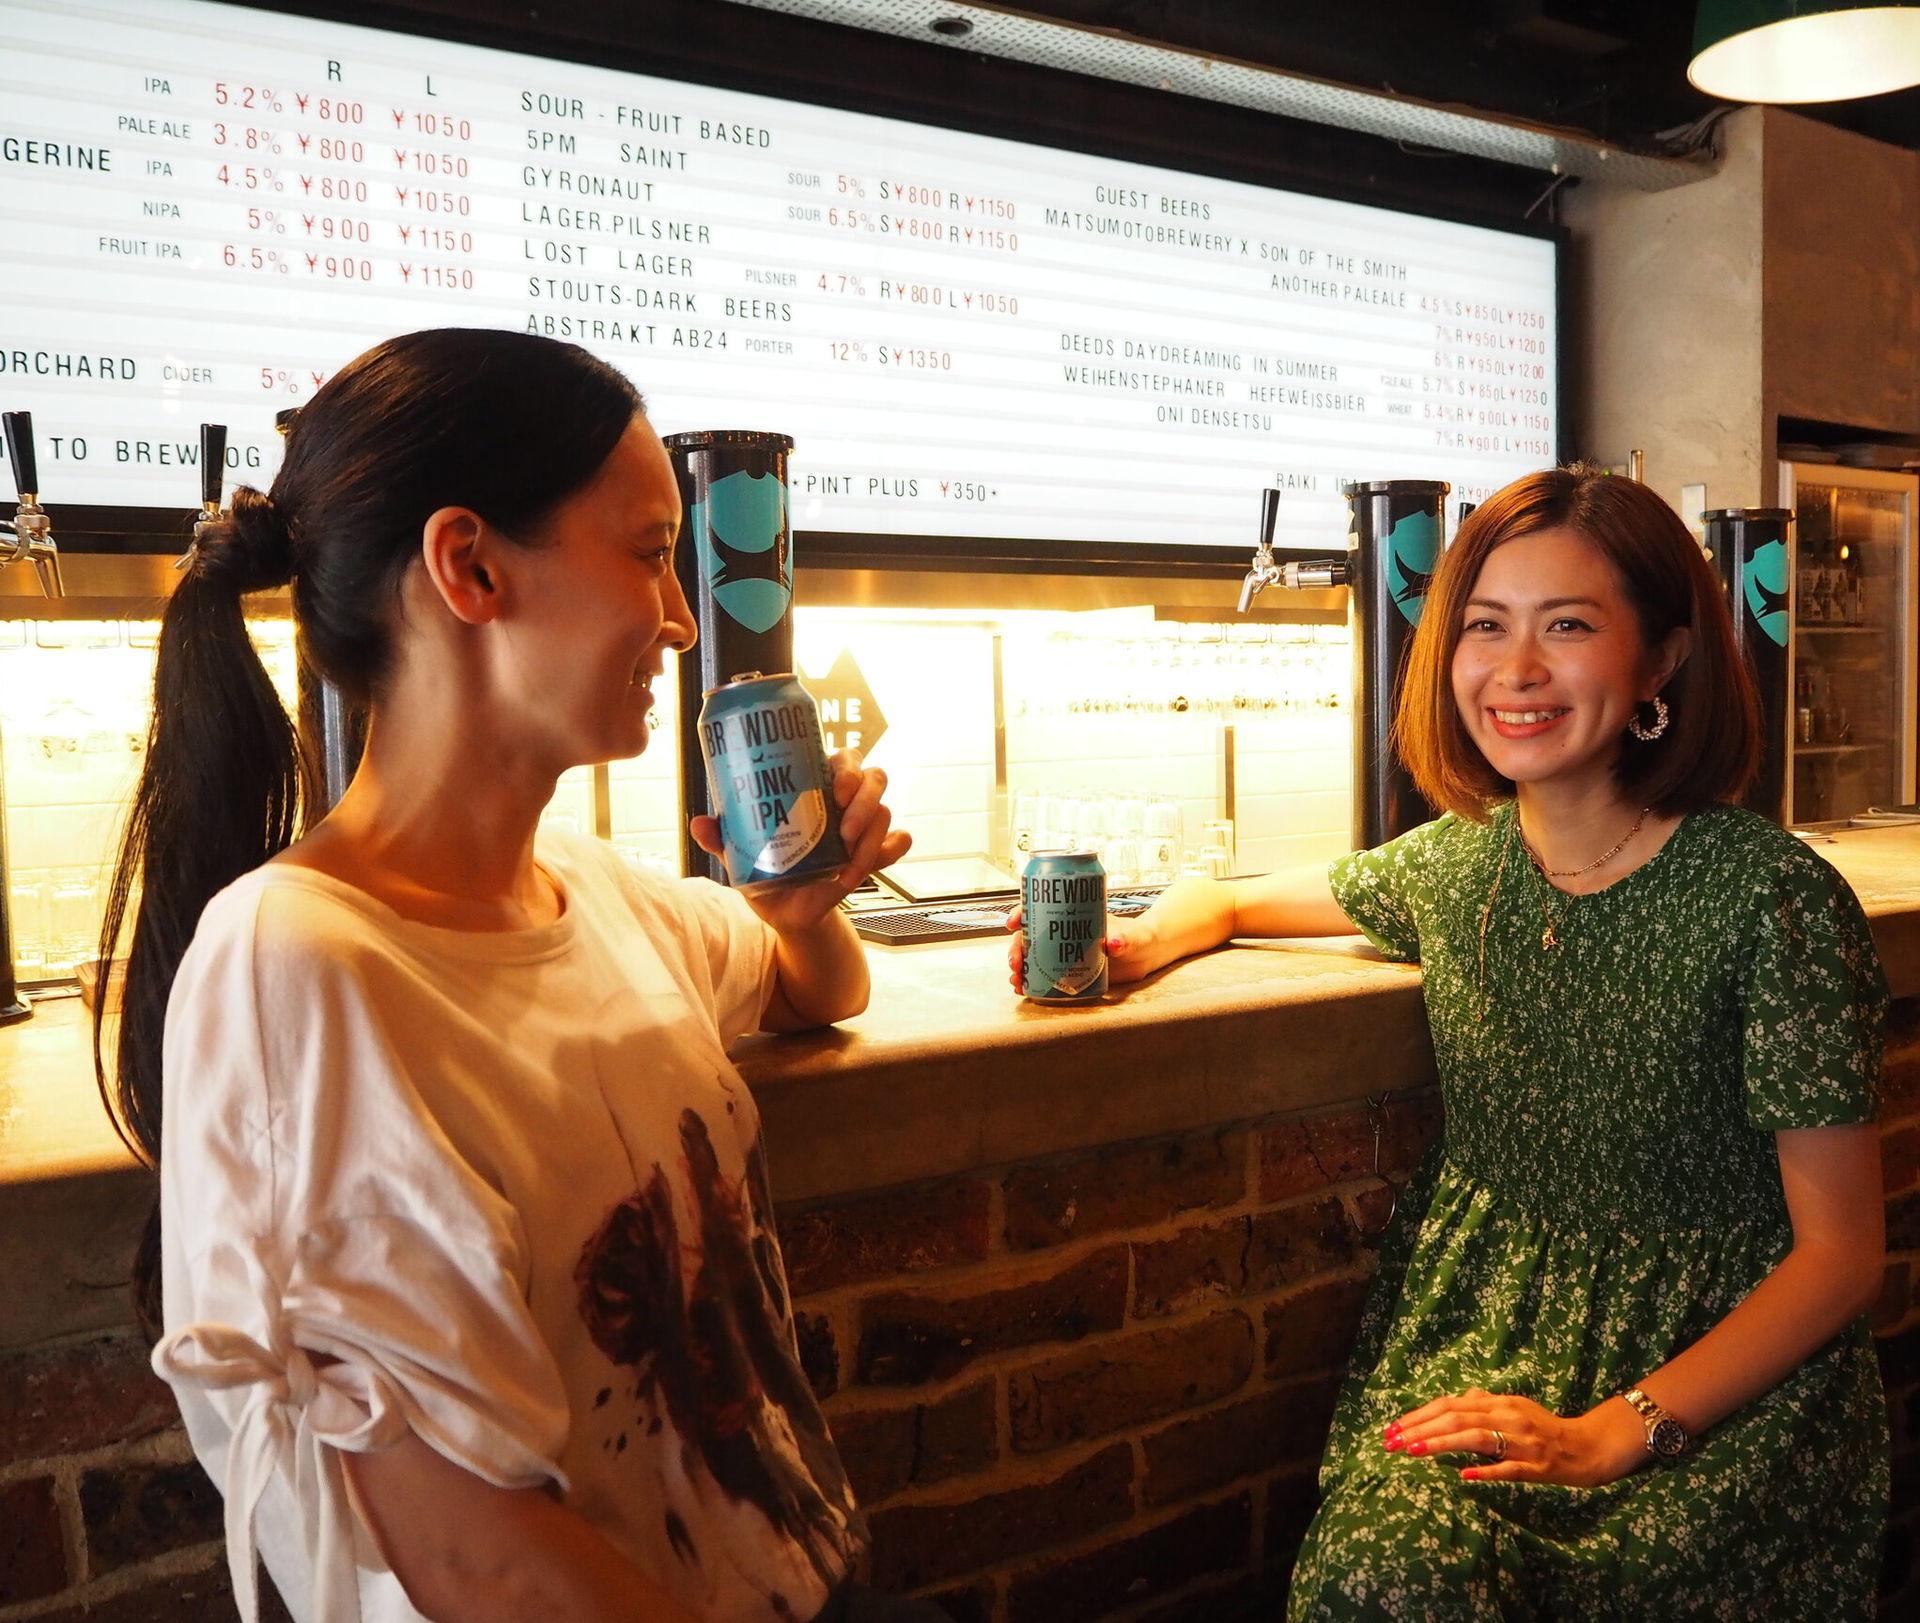 Two Japanese women enjoying a brewdog beer: BrewDog launches Japanese venture with the help of Asahi Japan